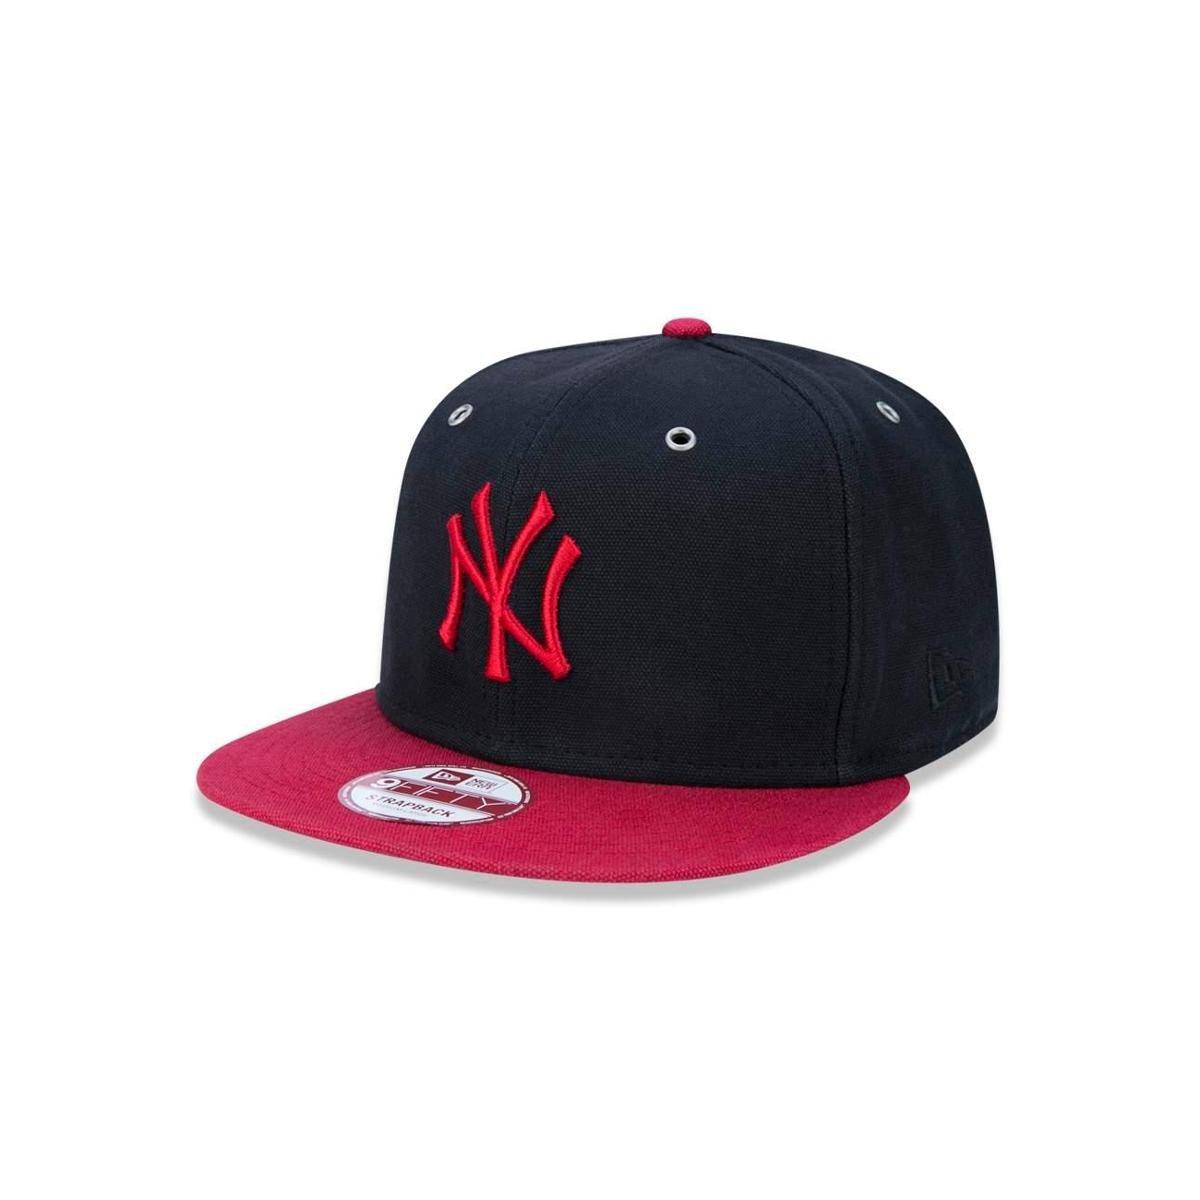 Boné 950 New York Yankees MLB Aba Reta New Era - Compre Agora  479a004bd28c8